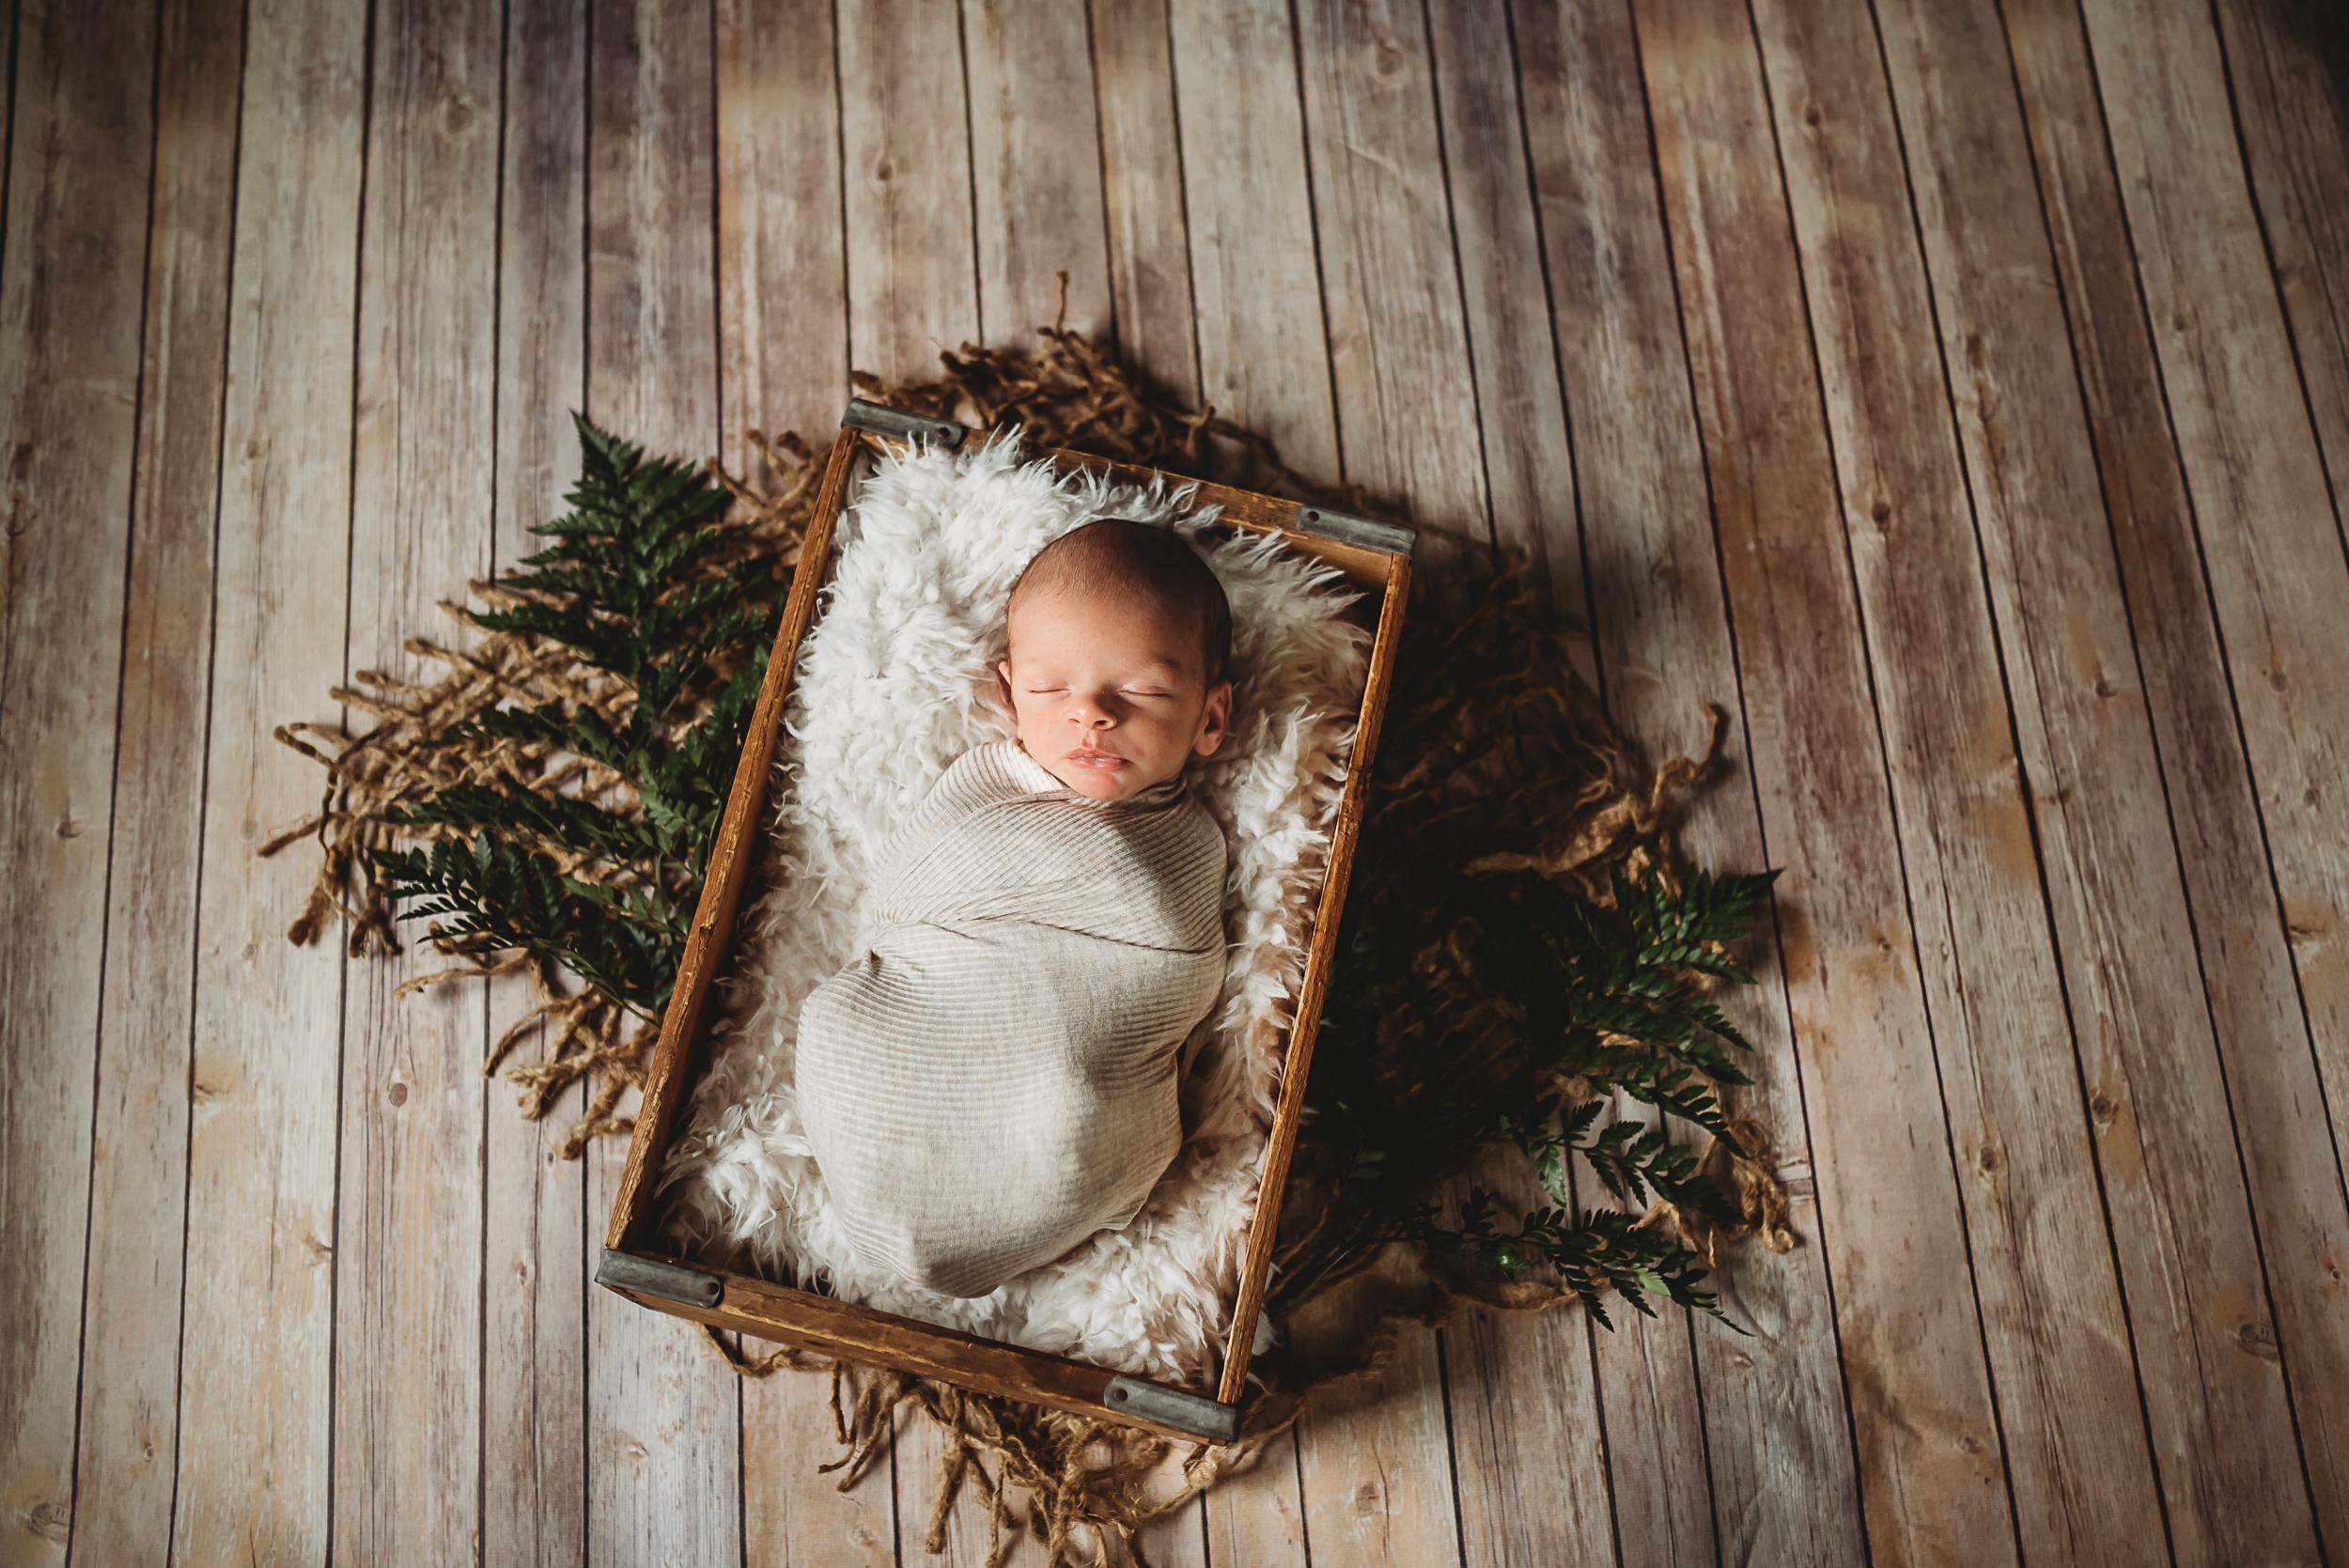 Colorado Springs, Colorado Newborn Photographer Ashley Hobel Photography